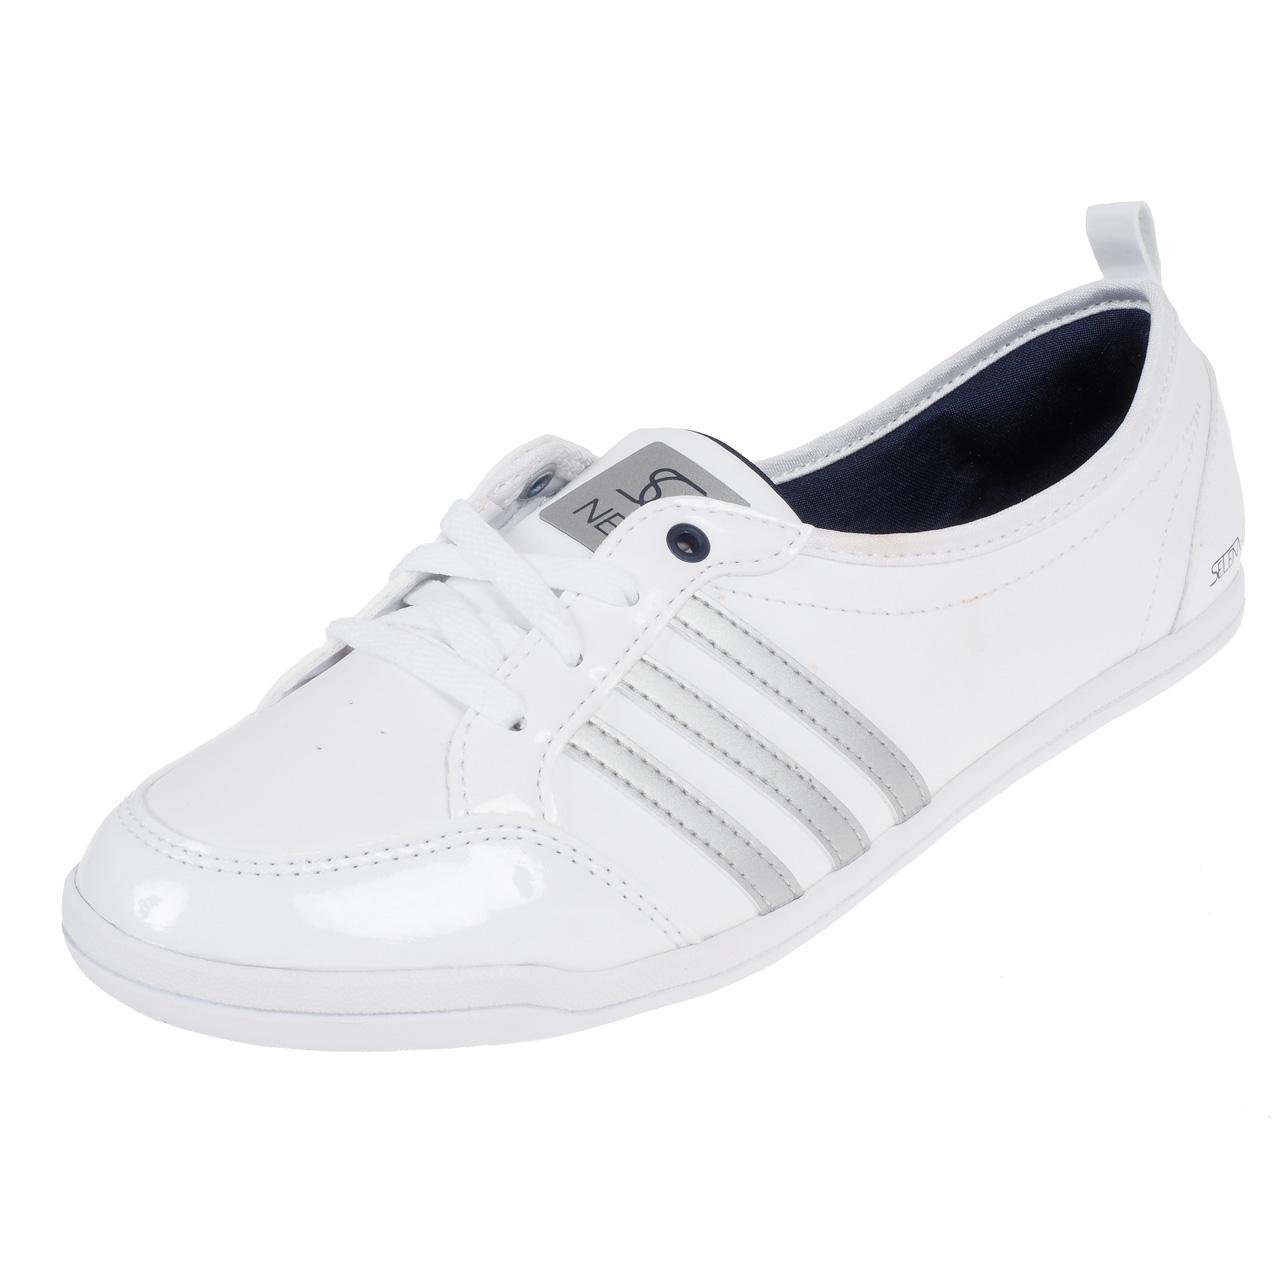 adidas neo blanche femme